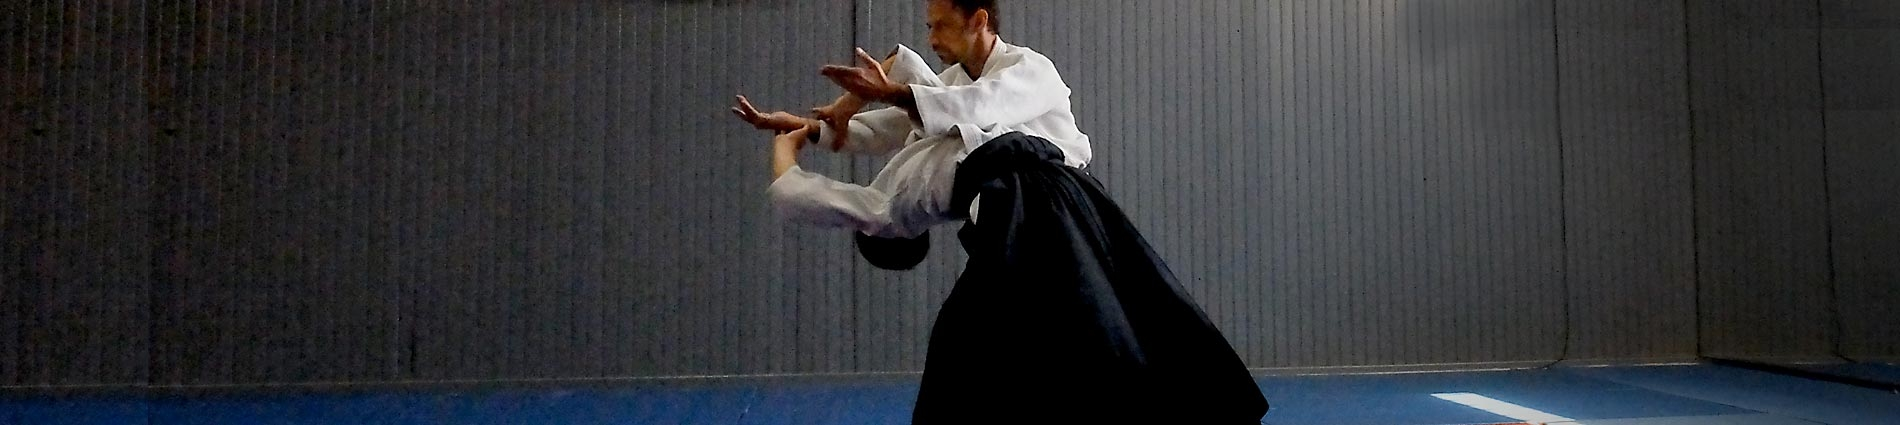 aikido histoire origine